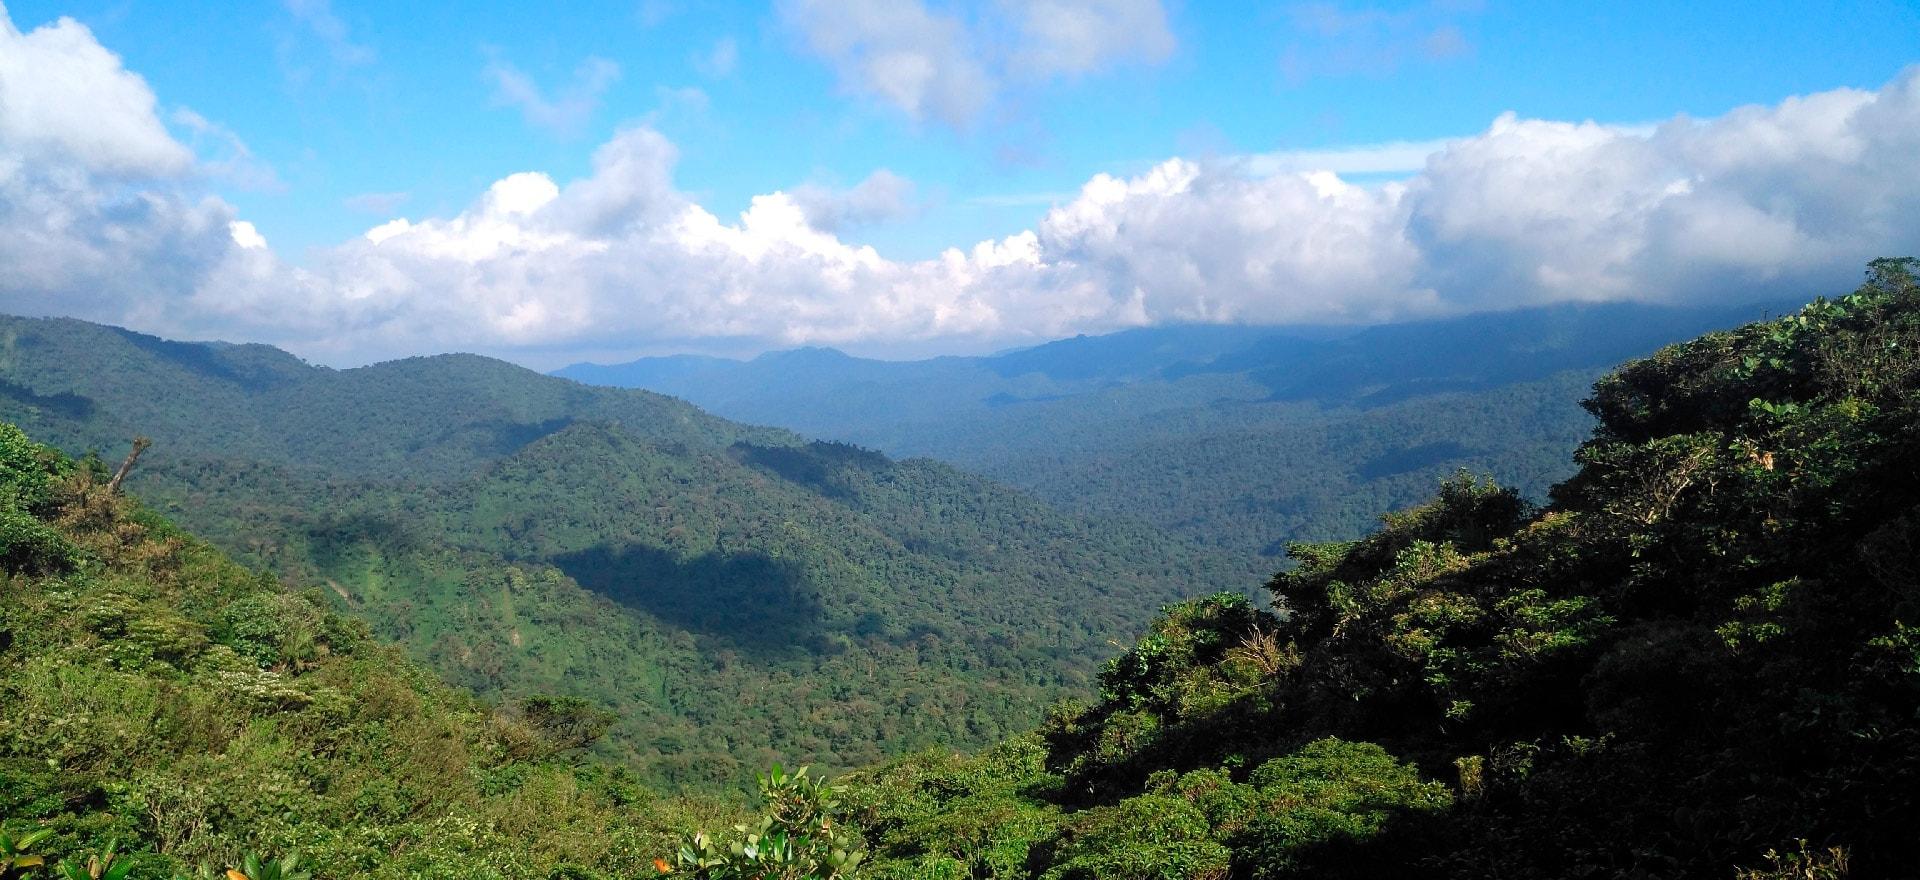 01-cursos-biologia-monteverde-centro-cientifico-tropical-min2-min